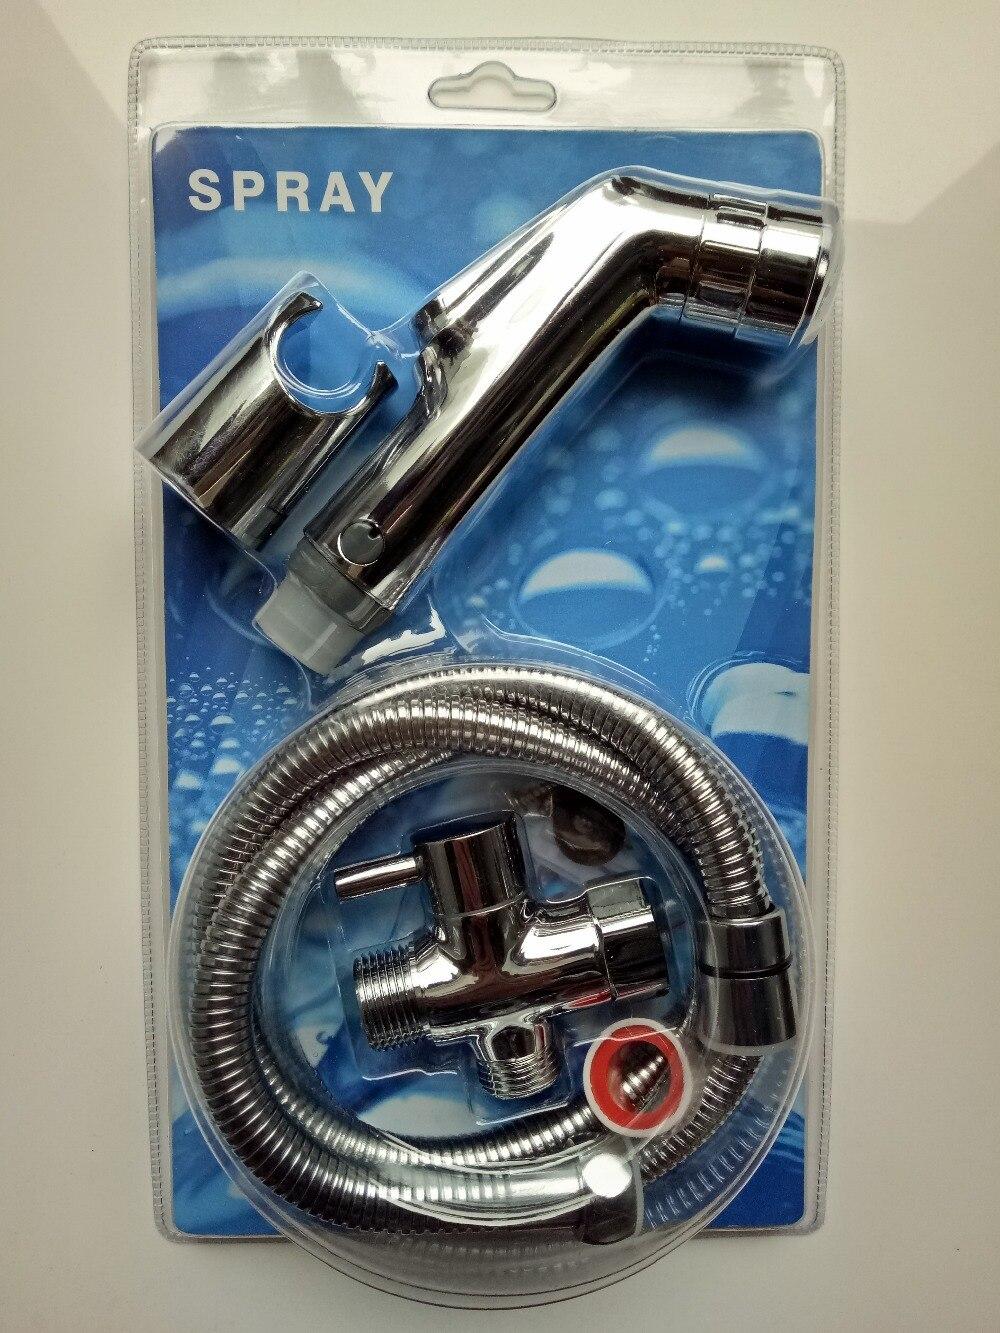 120 set/lot Double Mode bidet Sprayer toilet spray shattaf shower ...